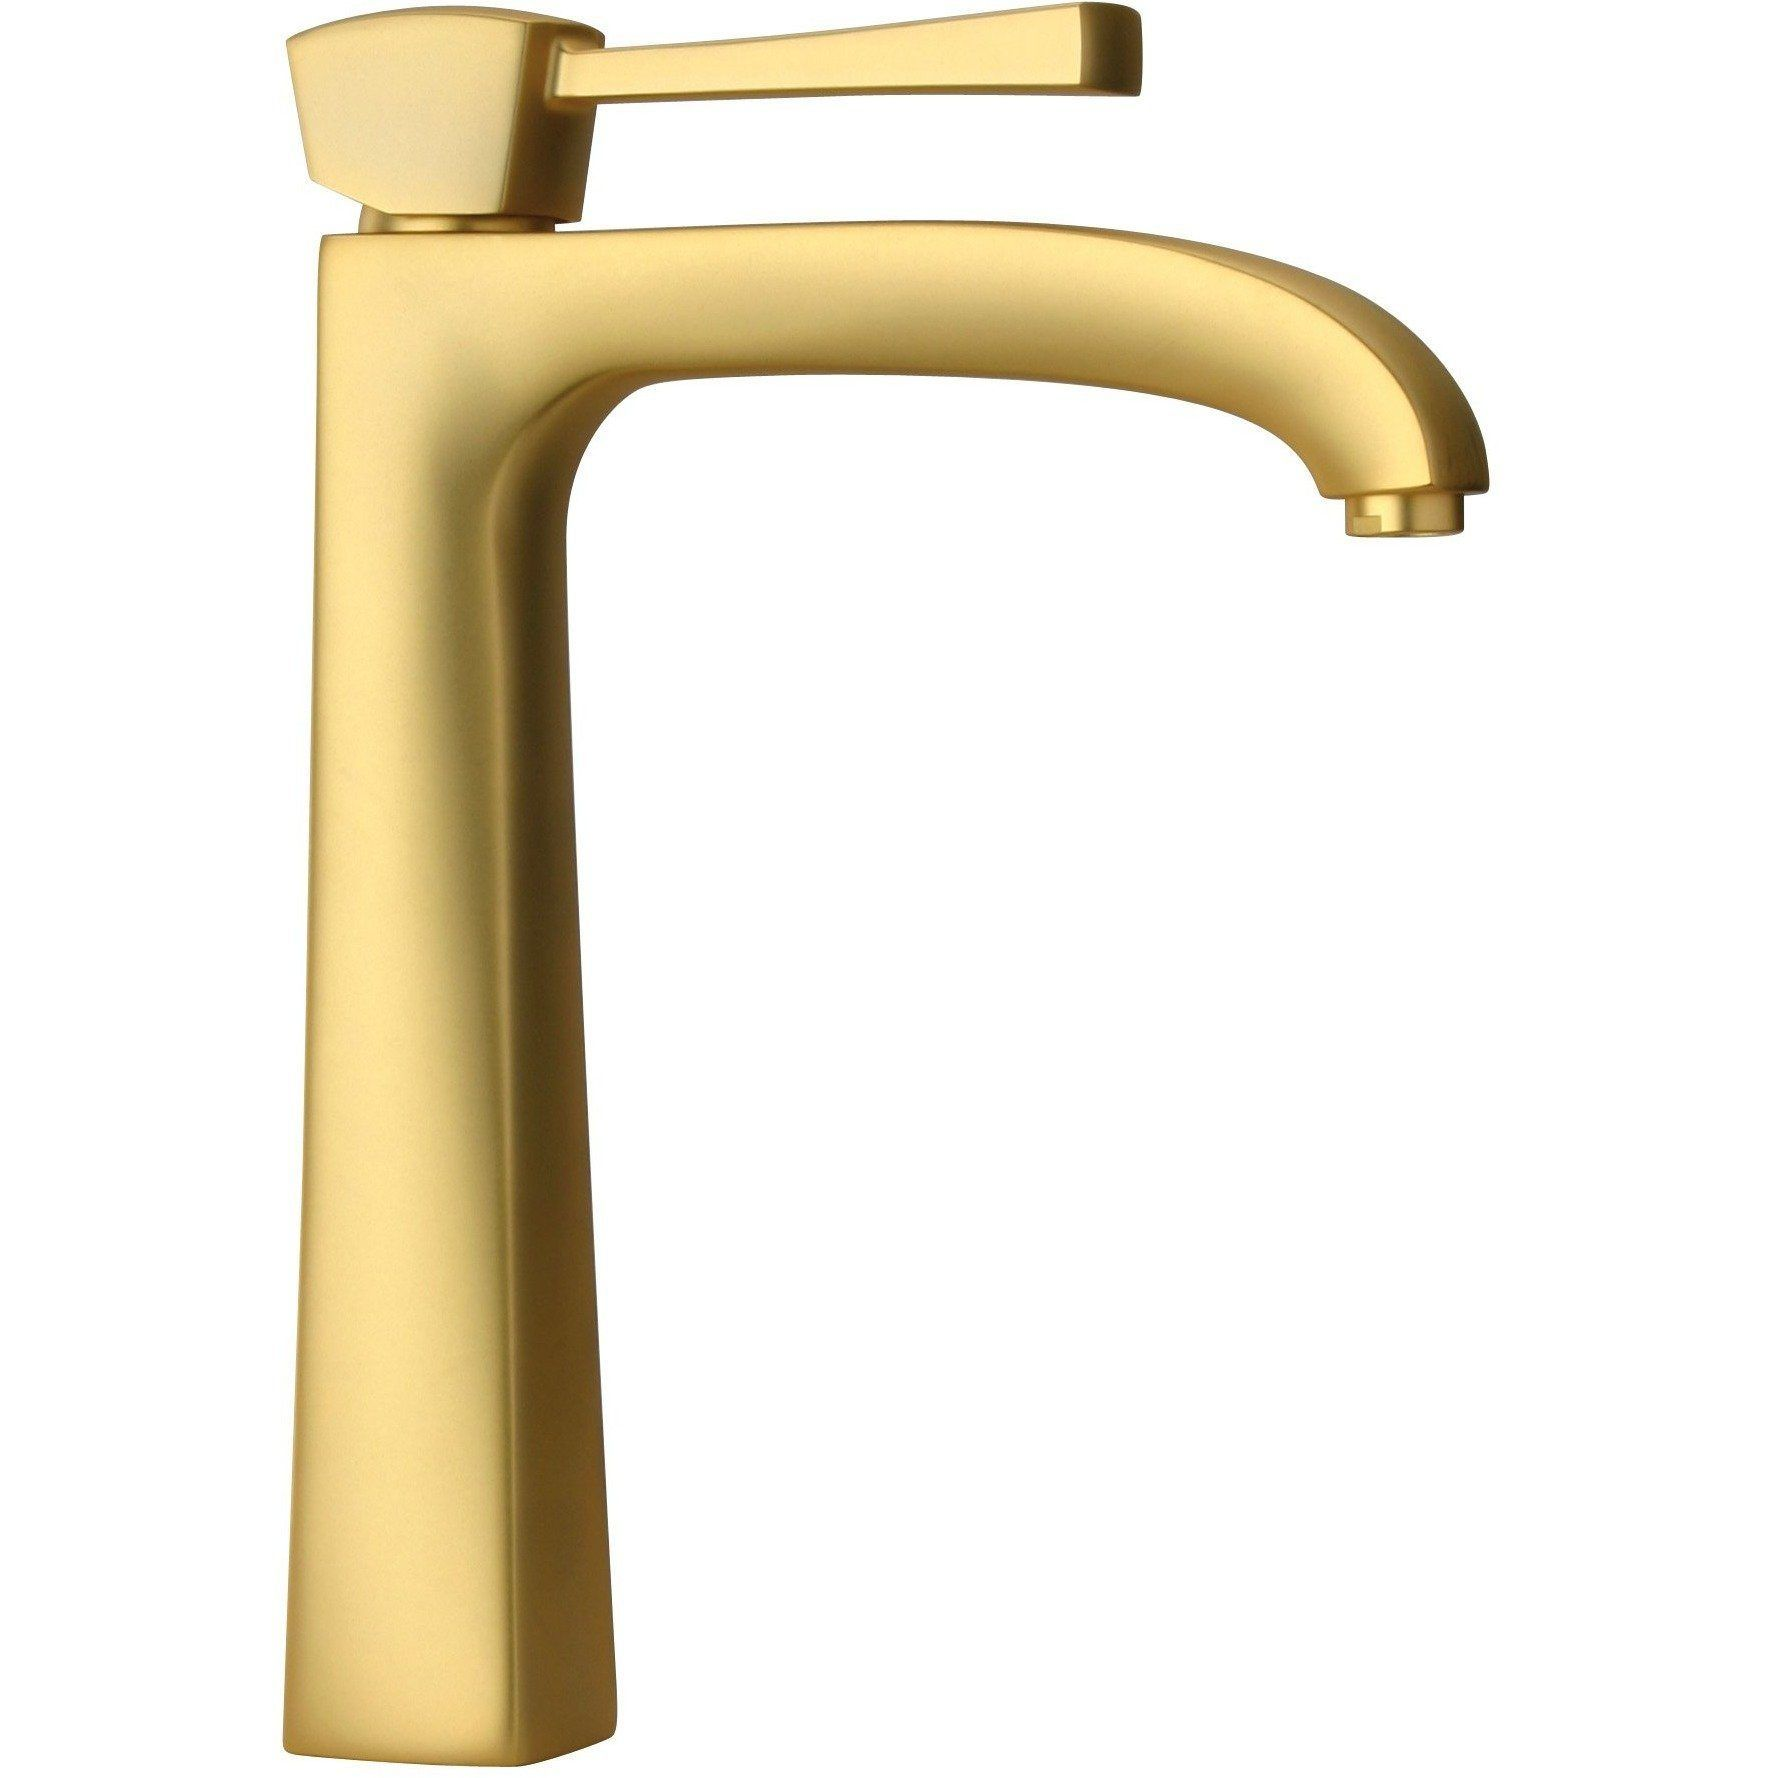 Lade Single Lever Handle Bathroom Vessel Filler Tall Faucet 1 2